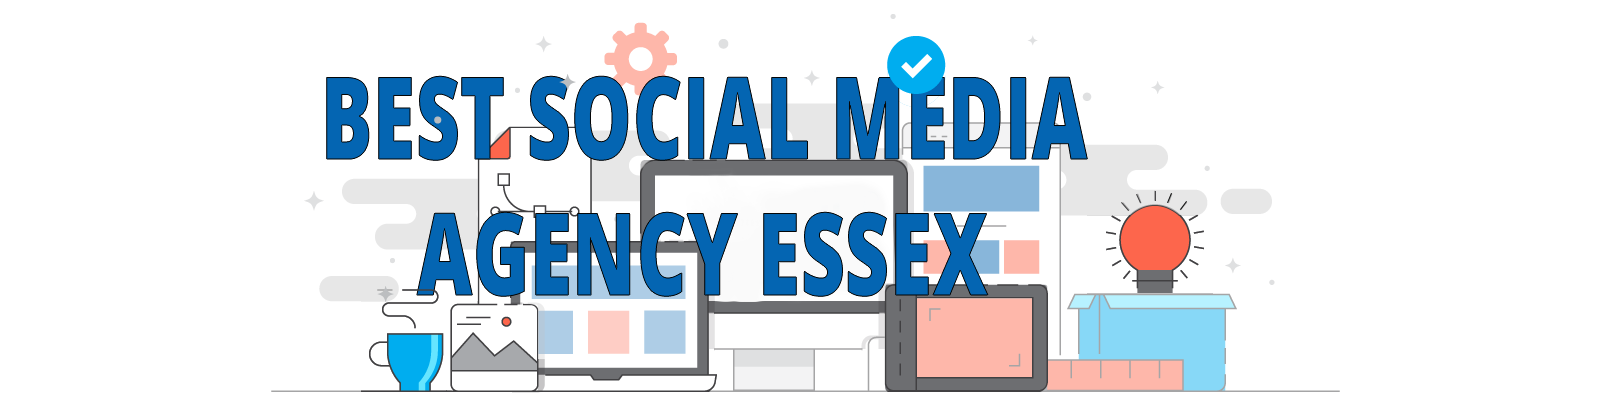 seek social best social media agency essex header with transparent background